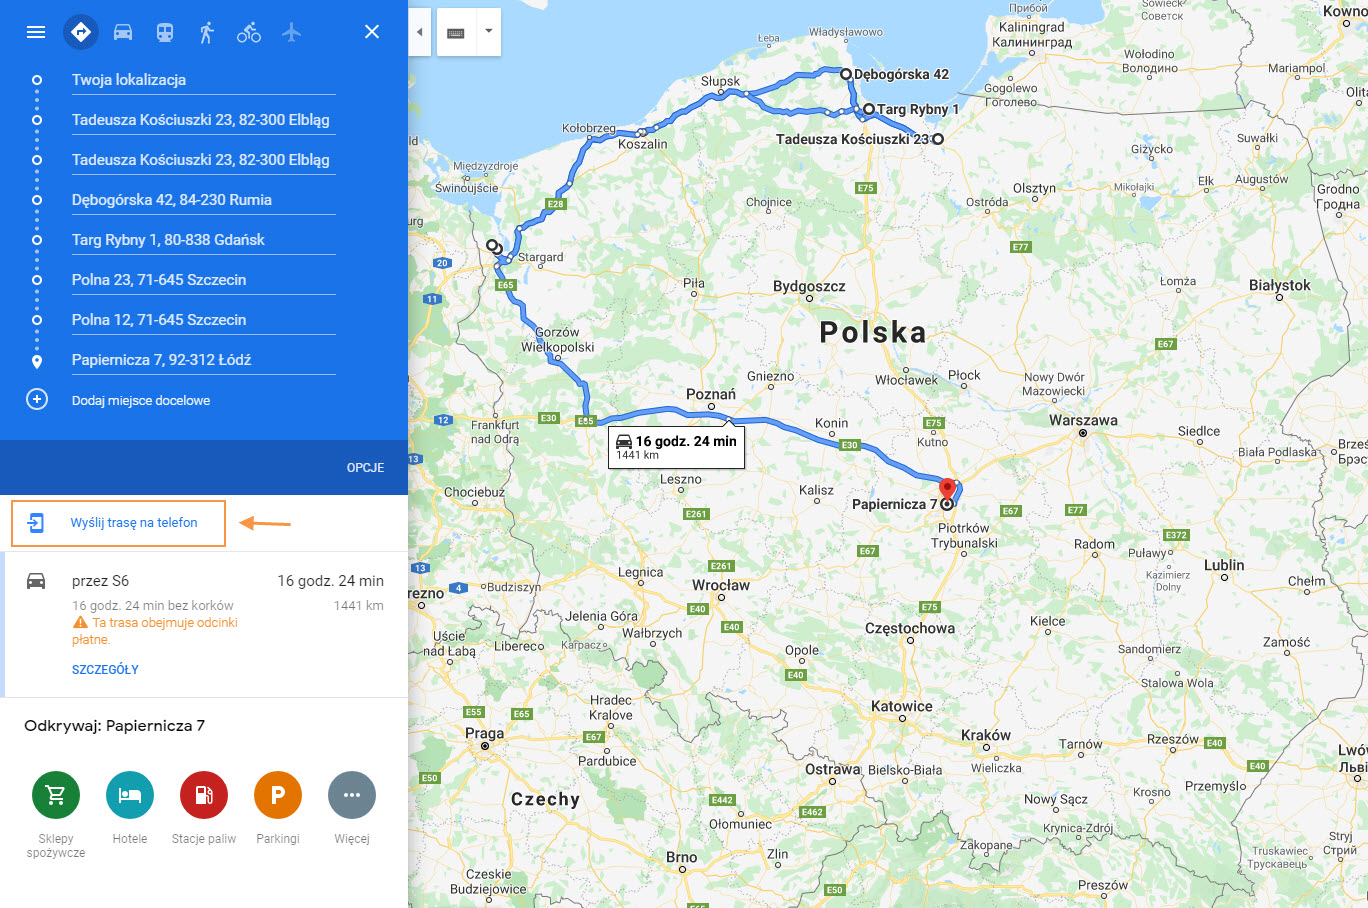 trasa_dojazdu_google_maps_optimasales